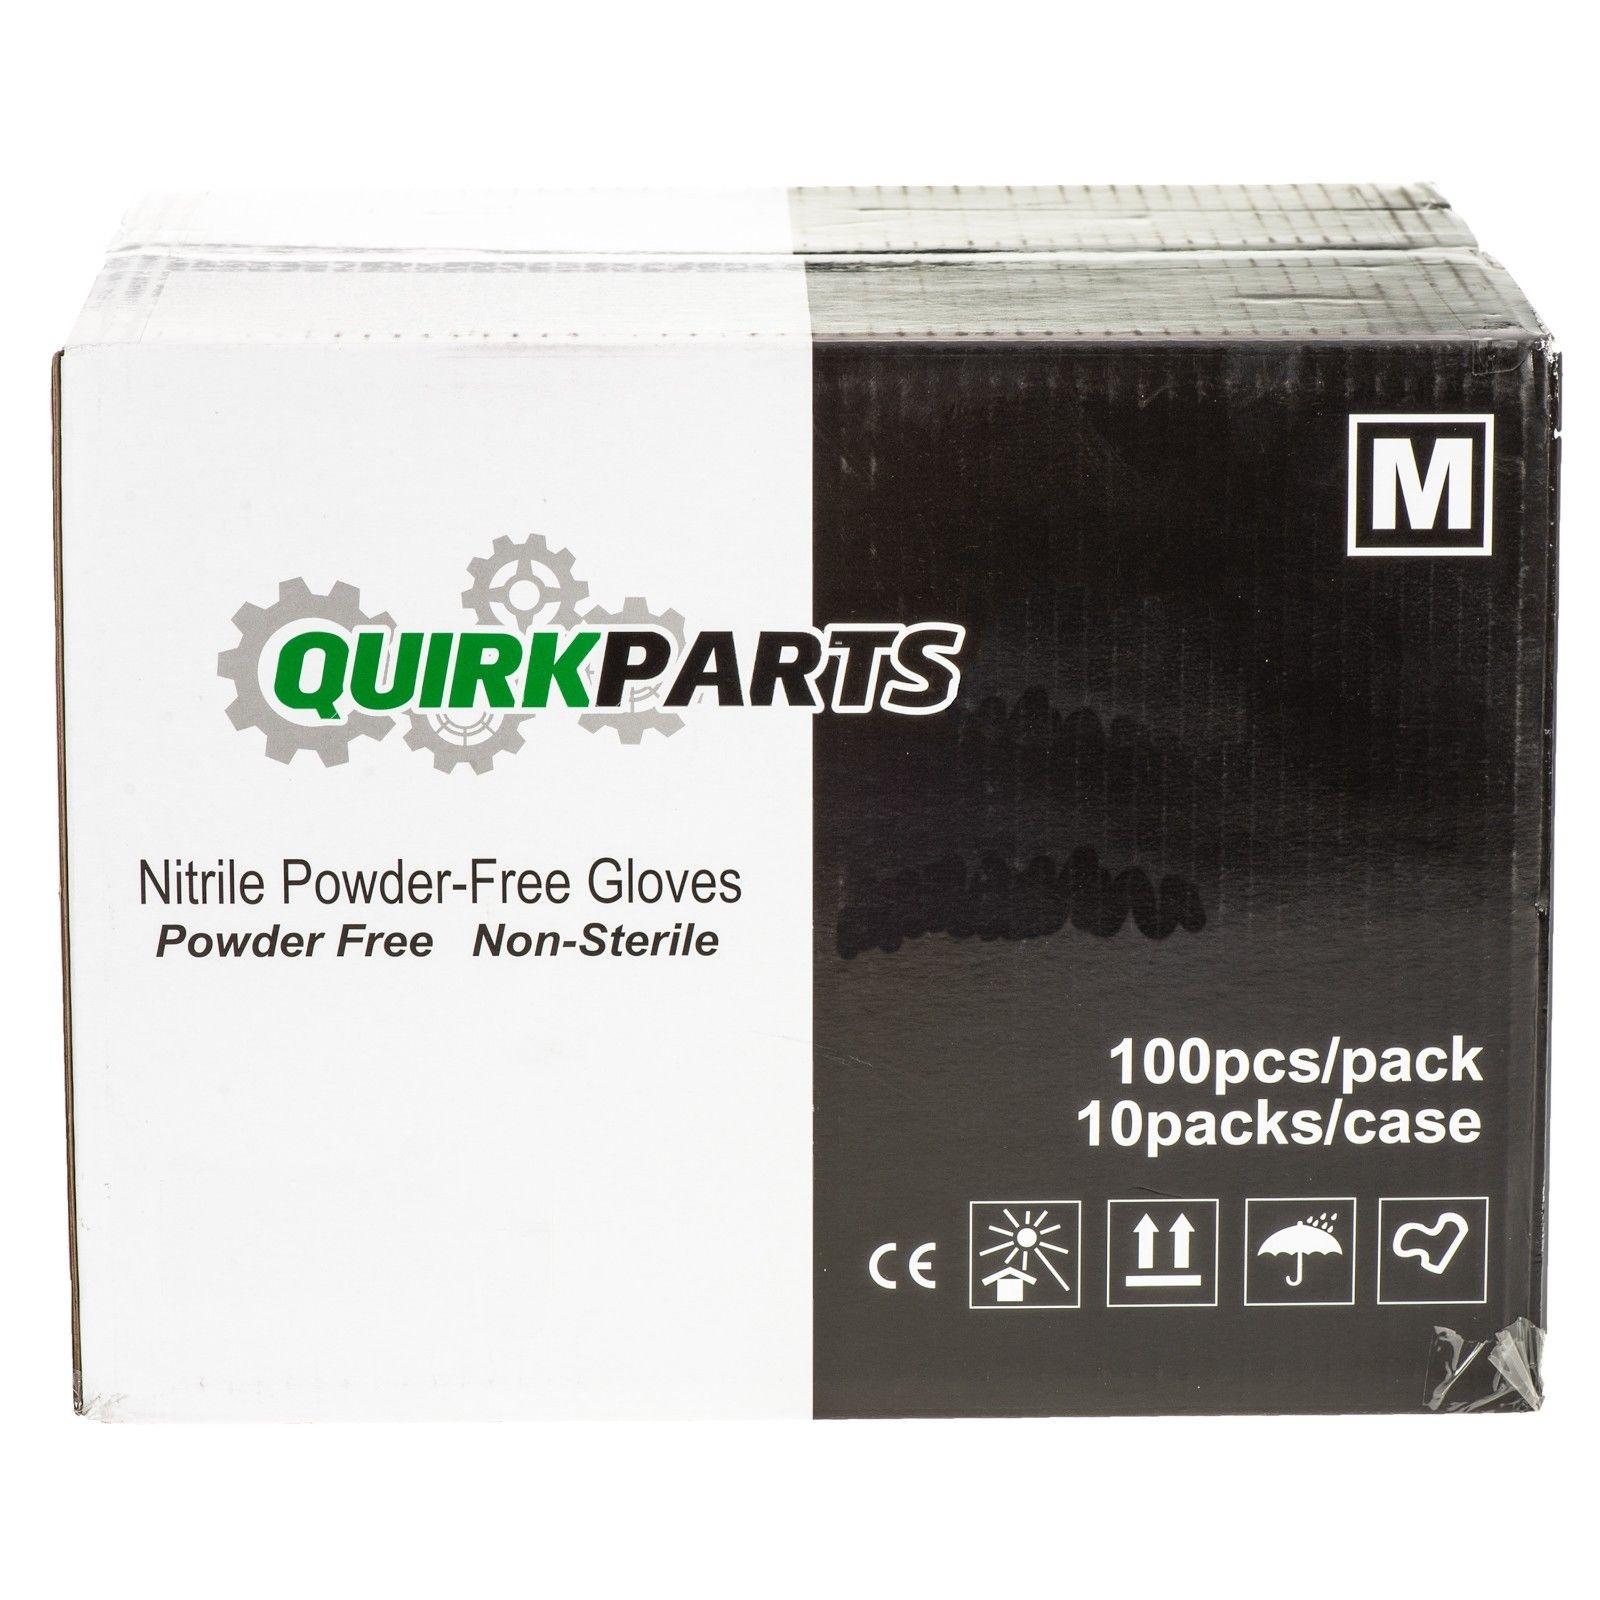 NEW Case Of 1000 Blue Nitrile Powder Free Disposable Non-Sterile Medium Gloves - Mopar (11321-10)